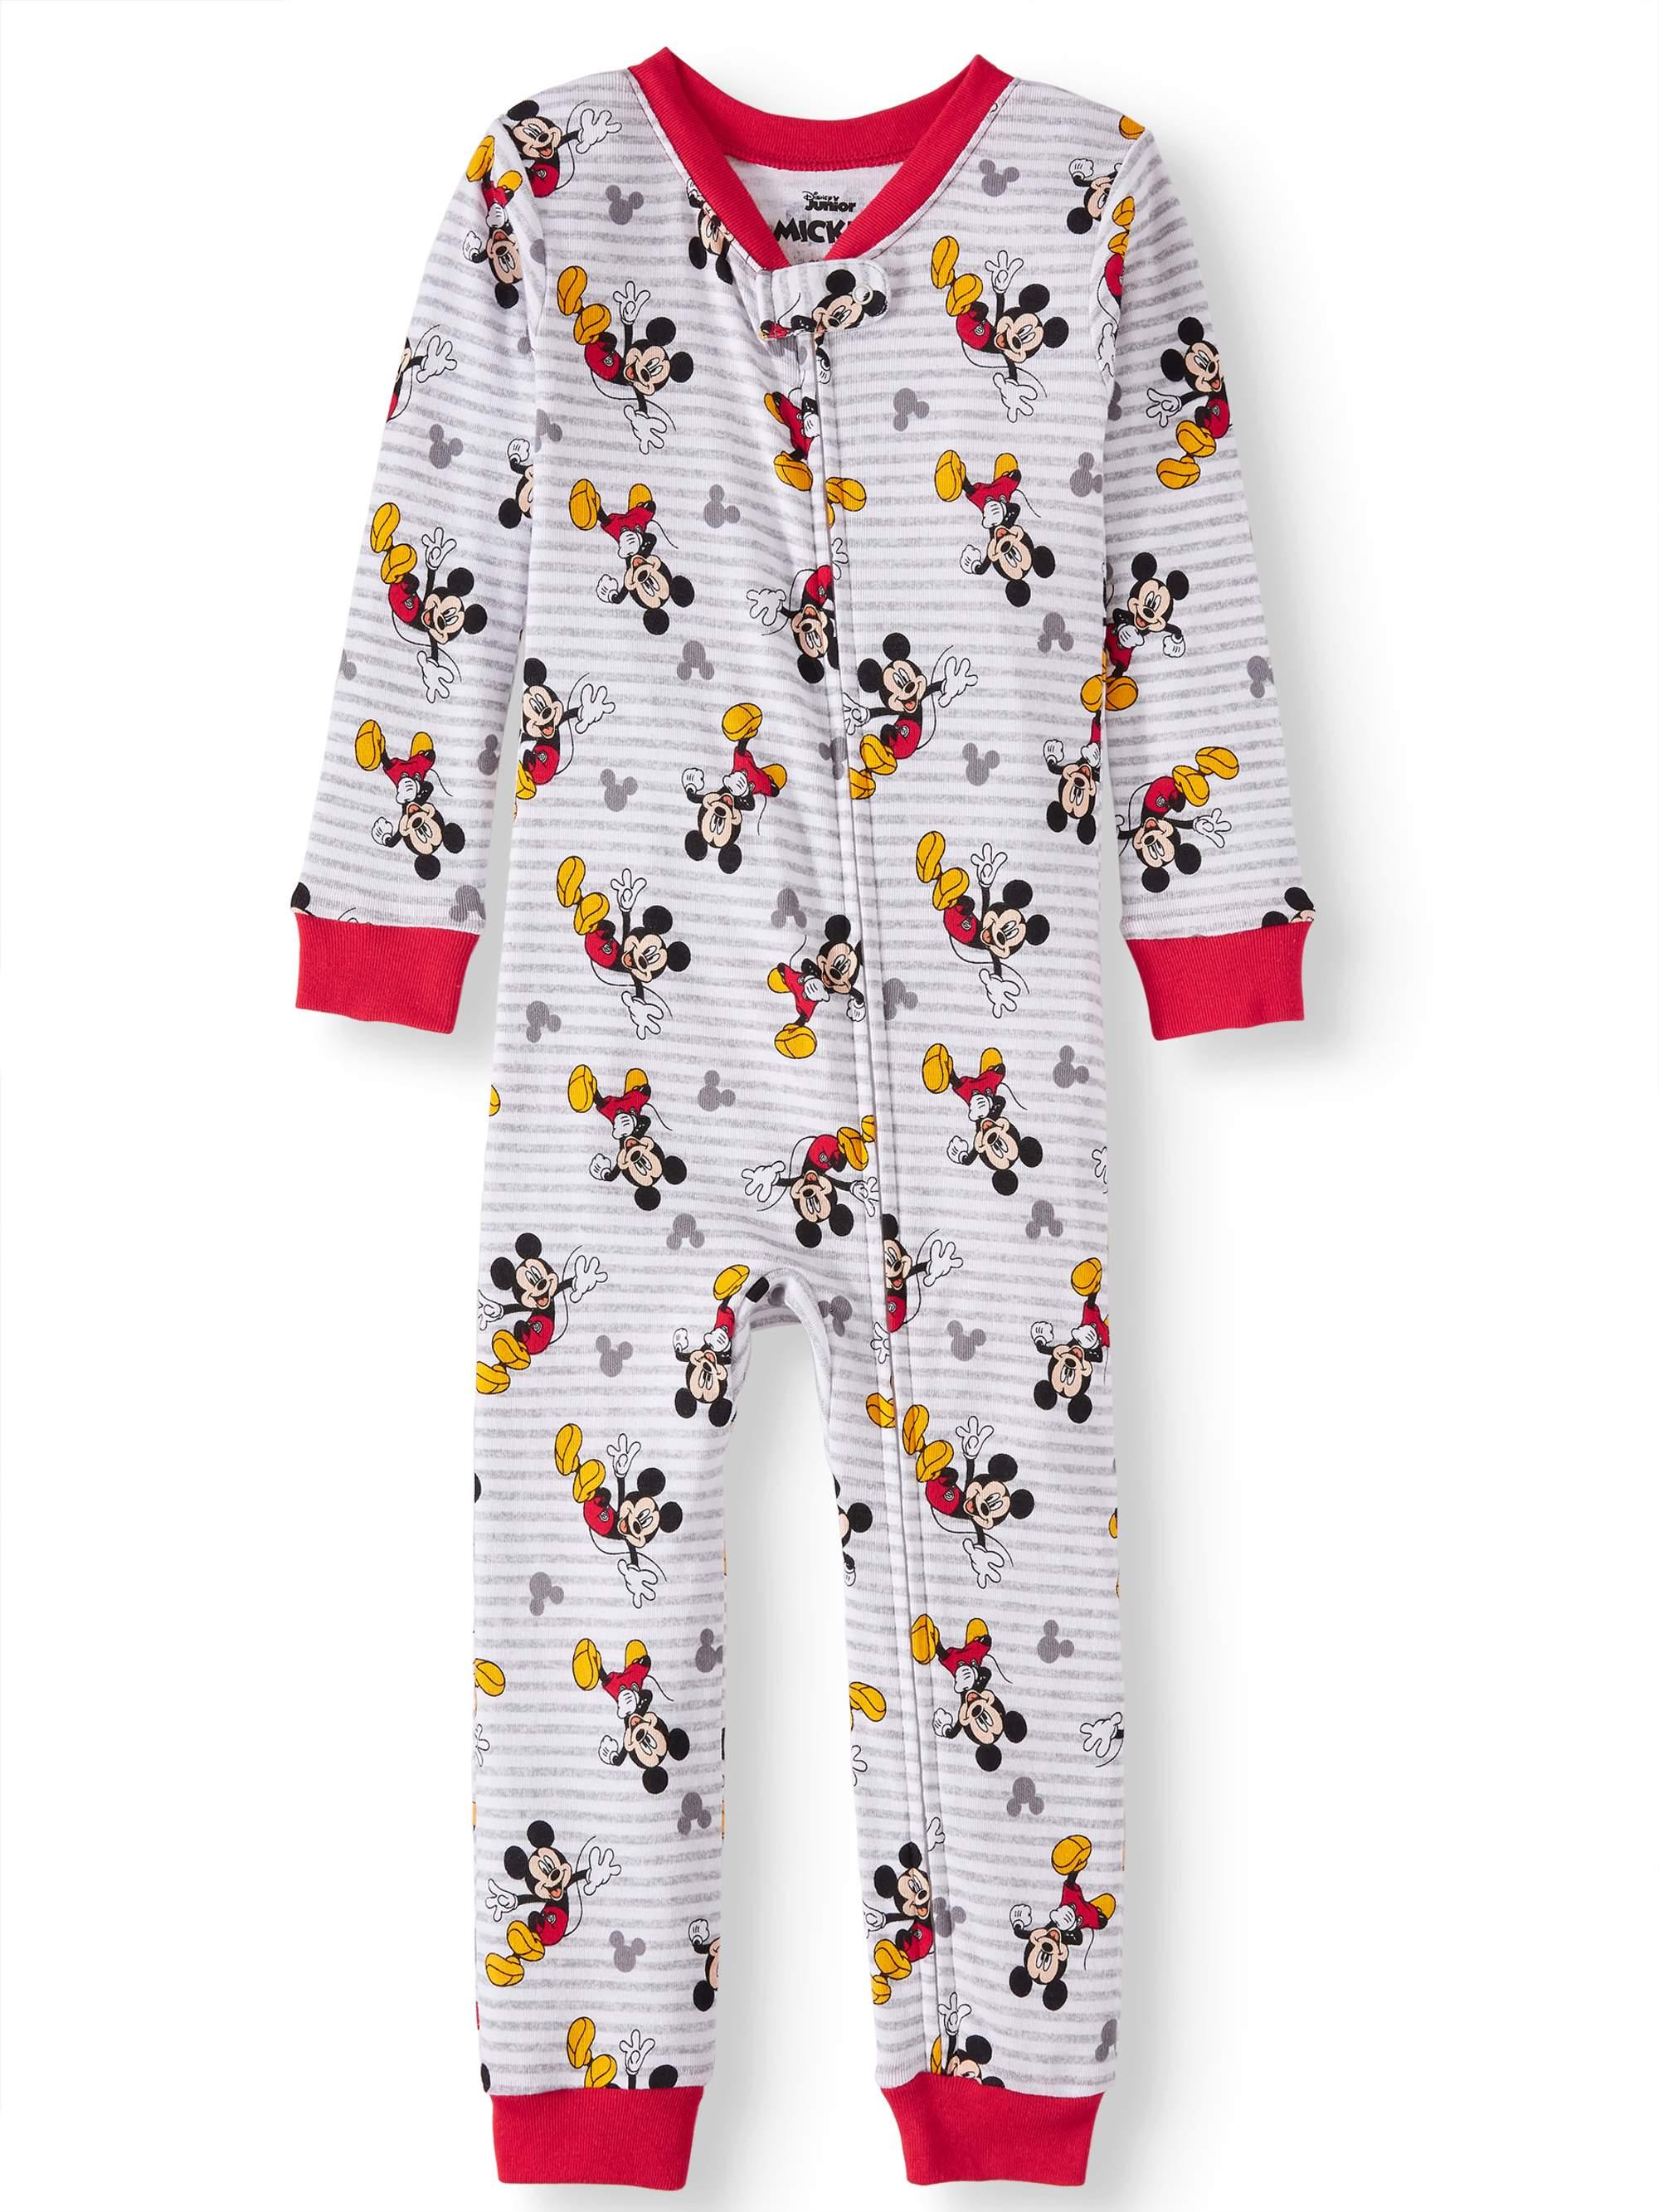 Toddler Boys' Mickey Mouse Cotton Footless Pajama Sleeper